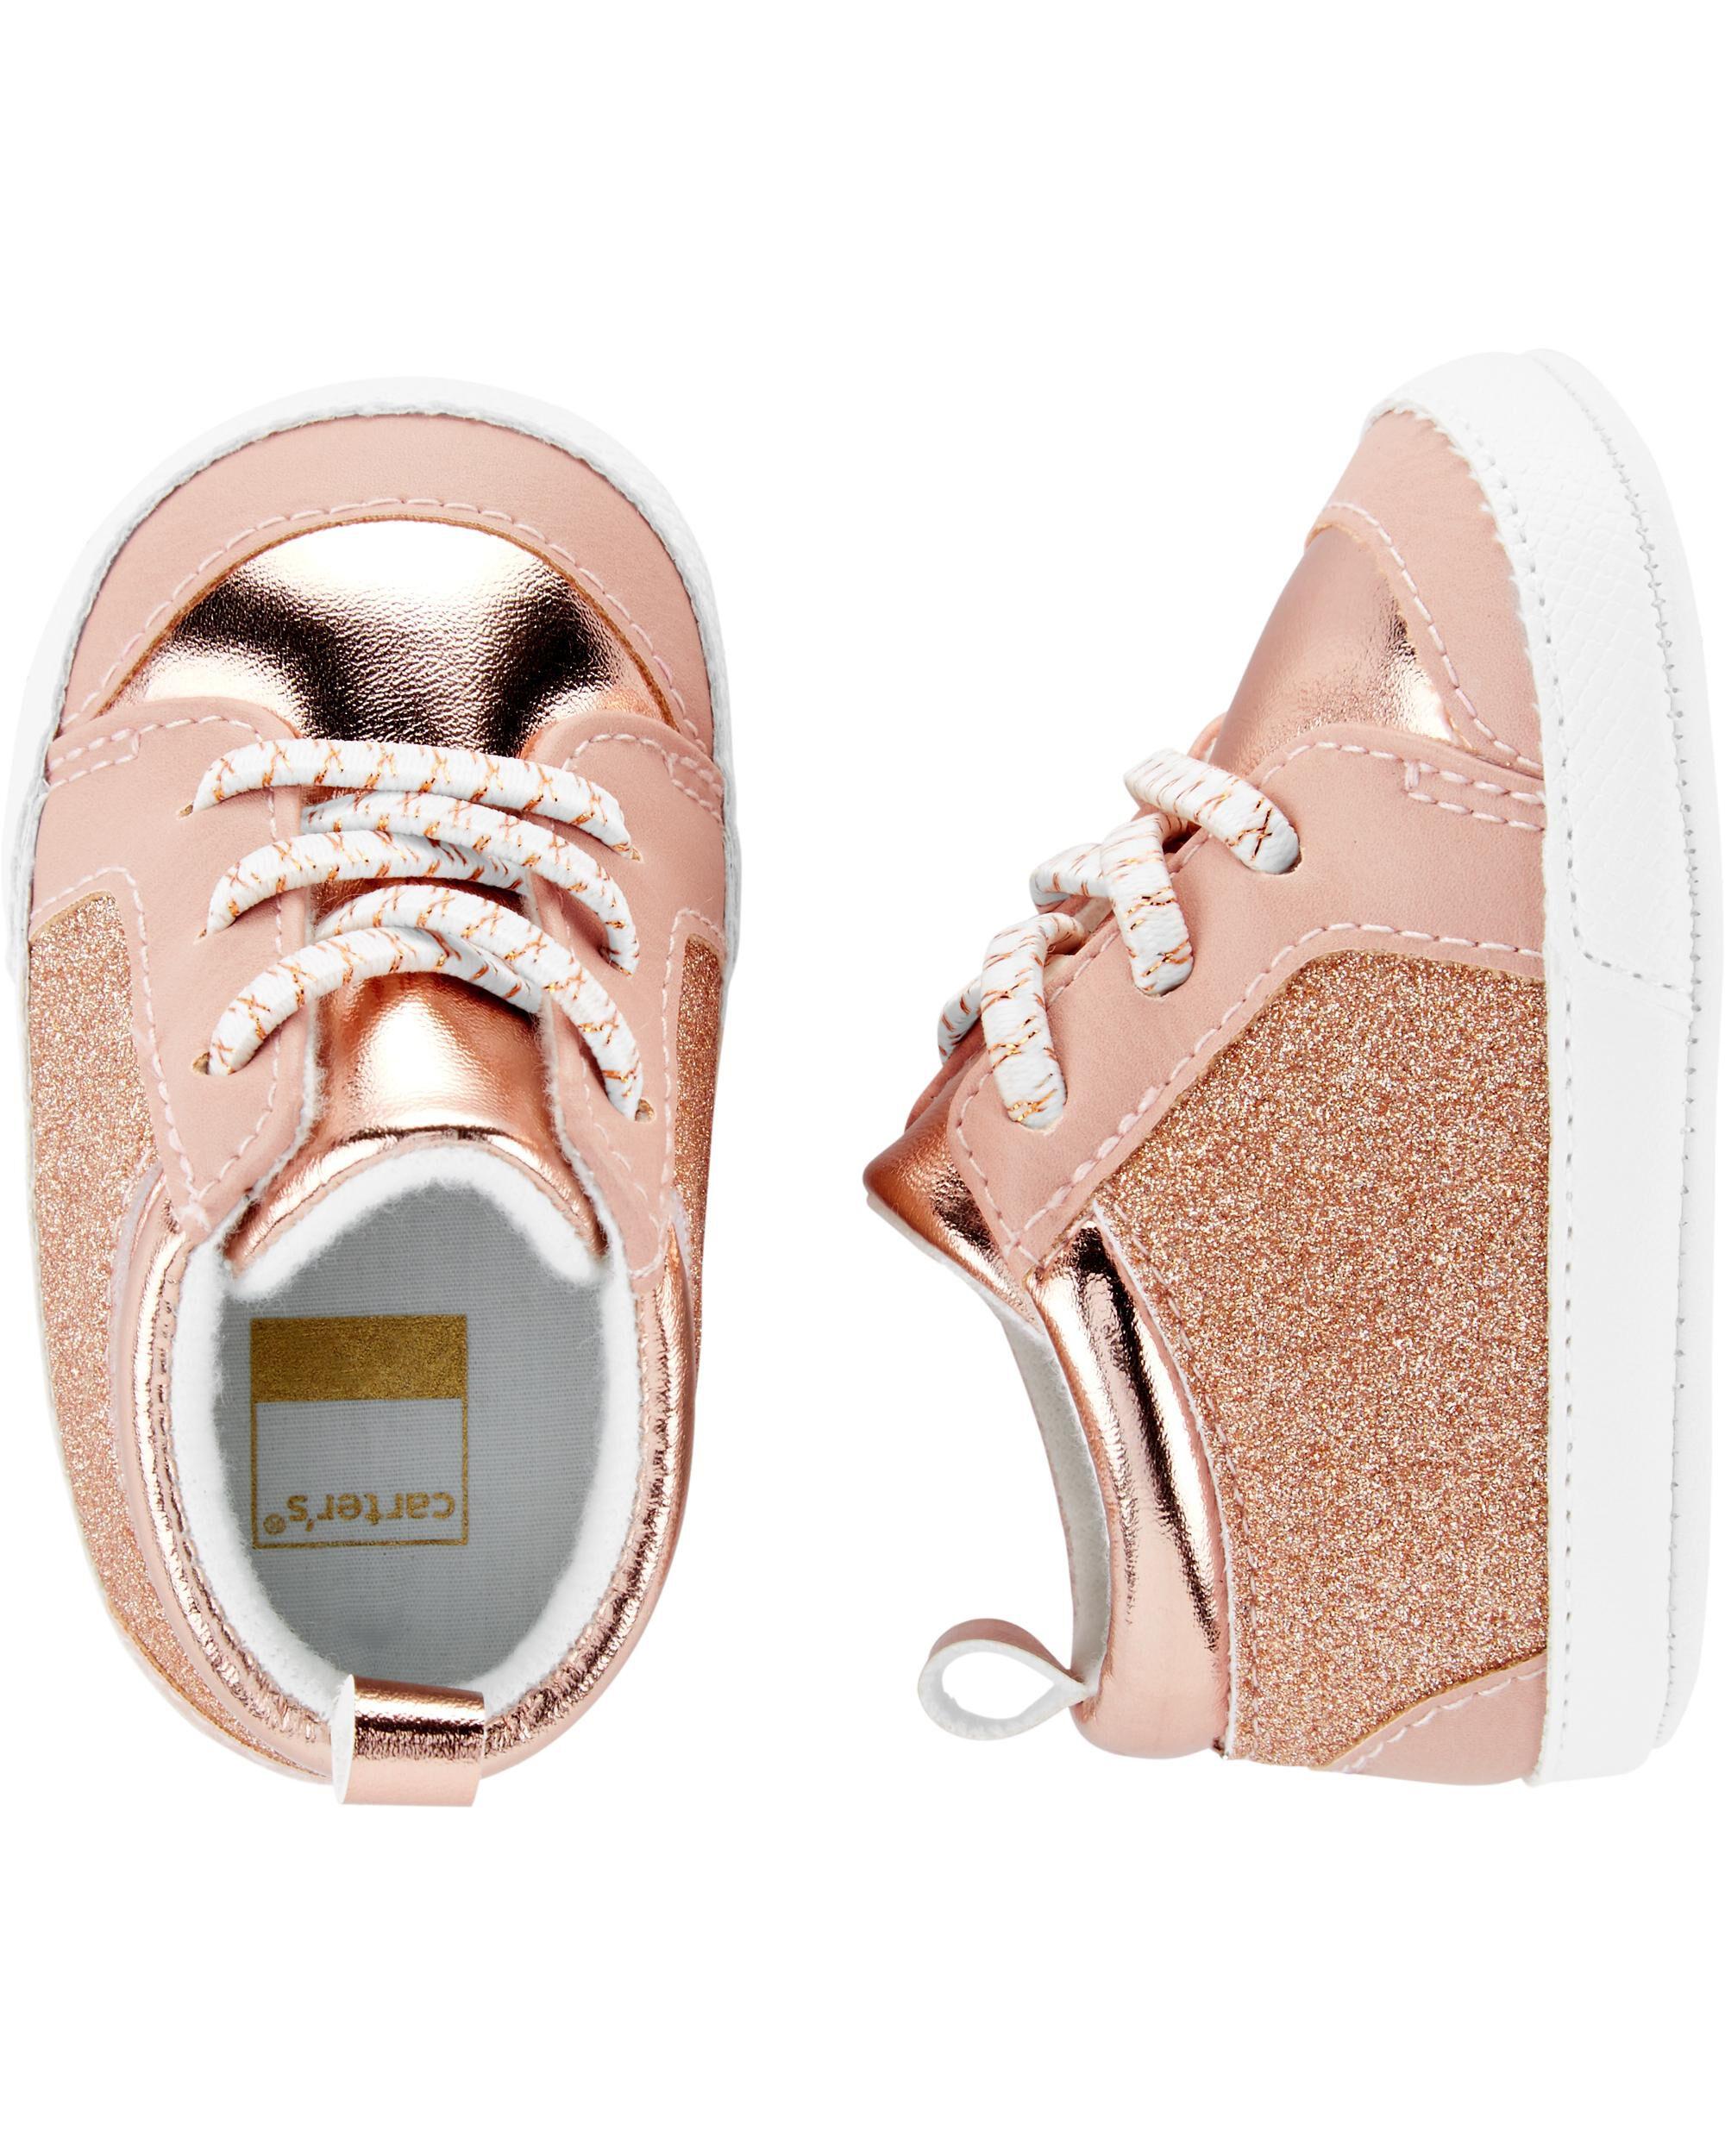 Glitter Sneaker Baby Shoes | carters